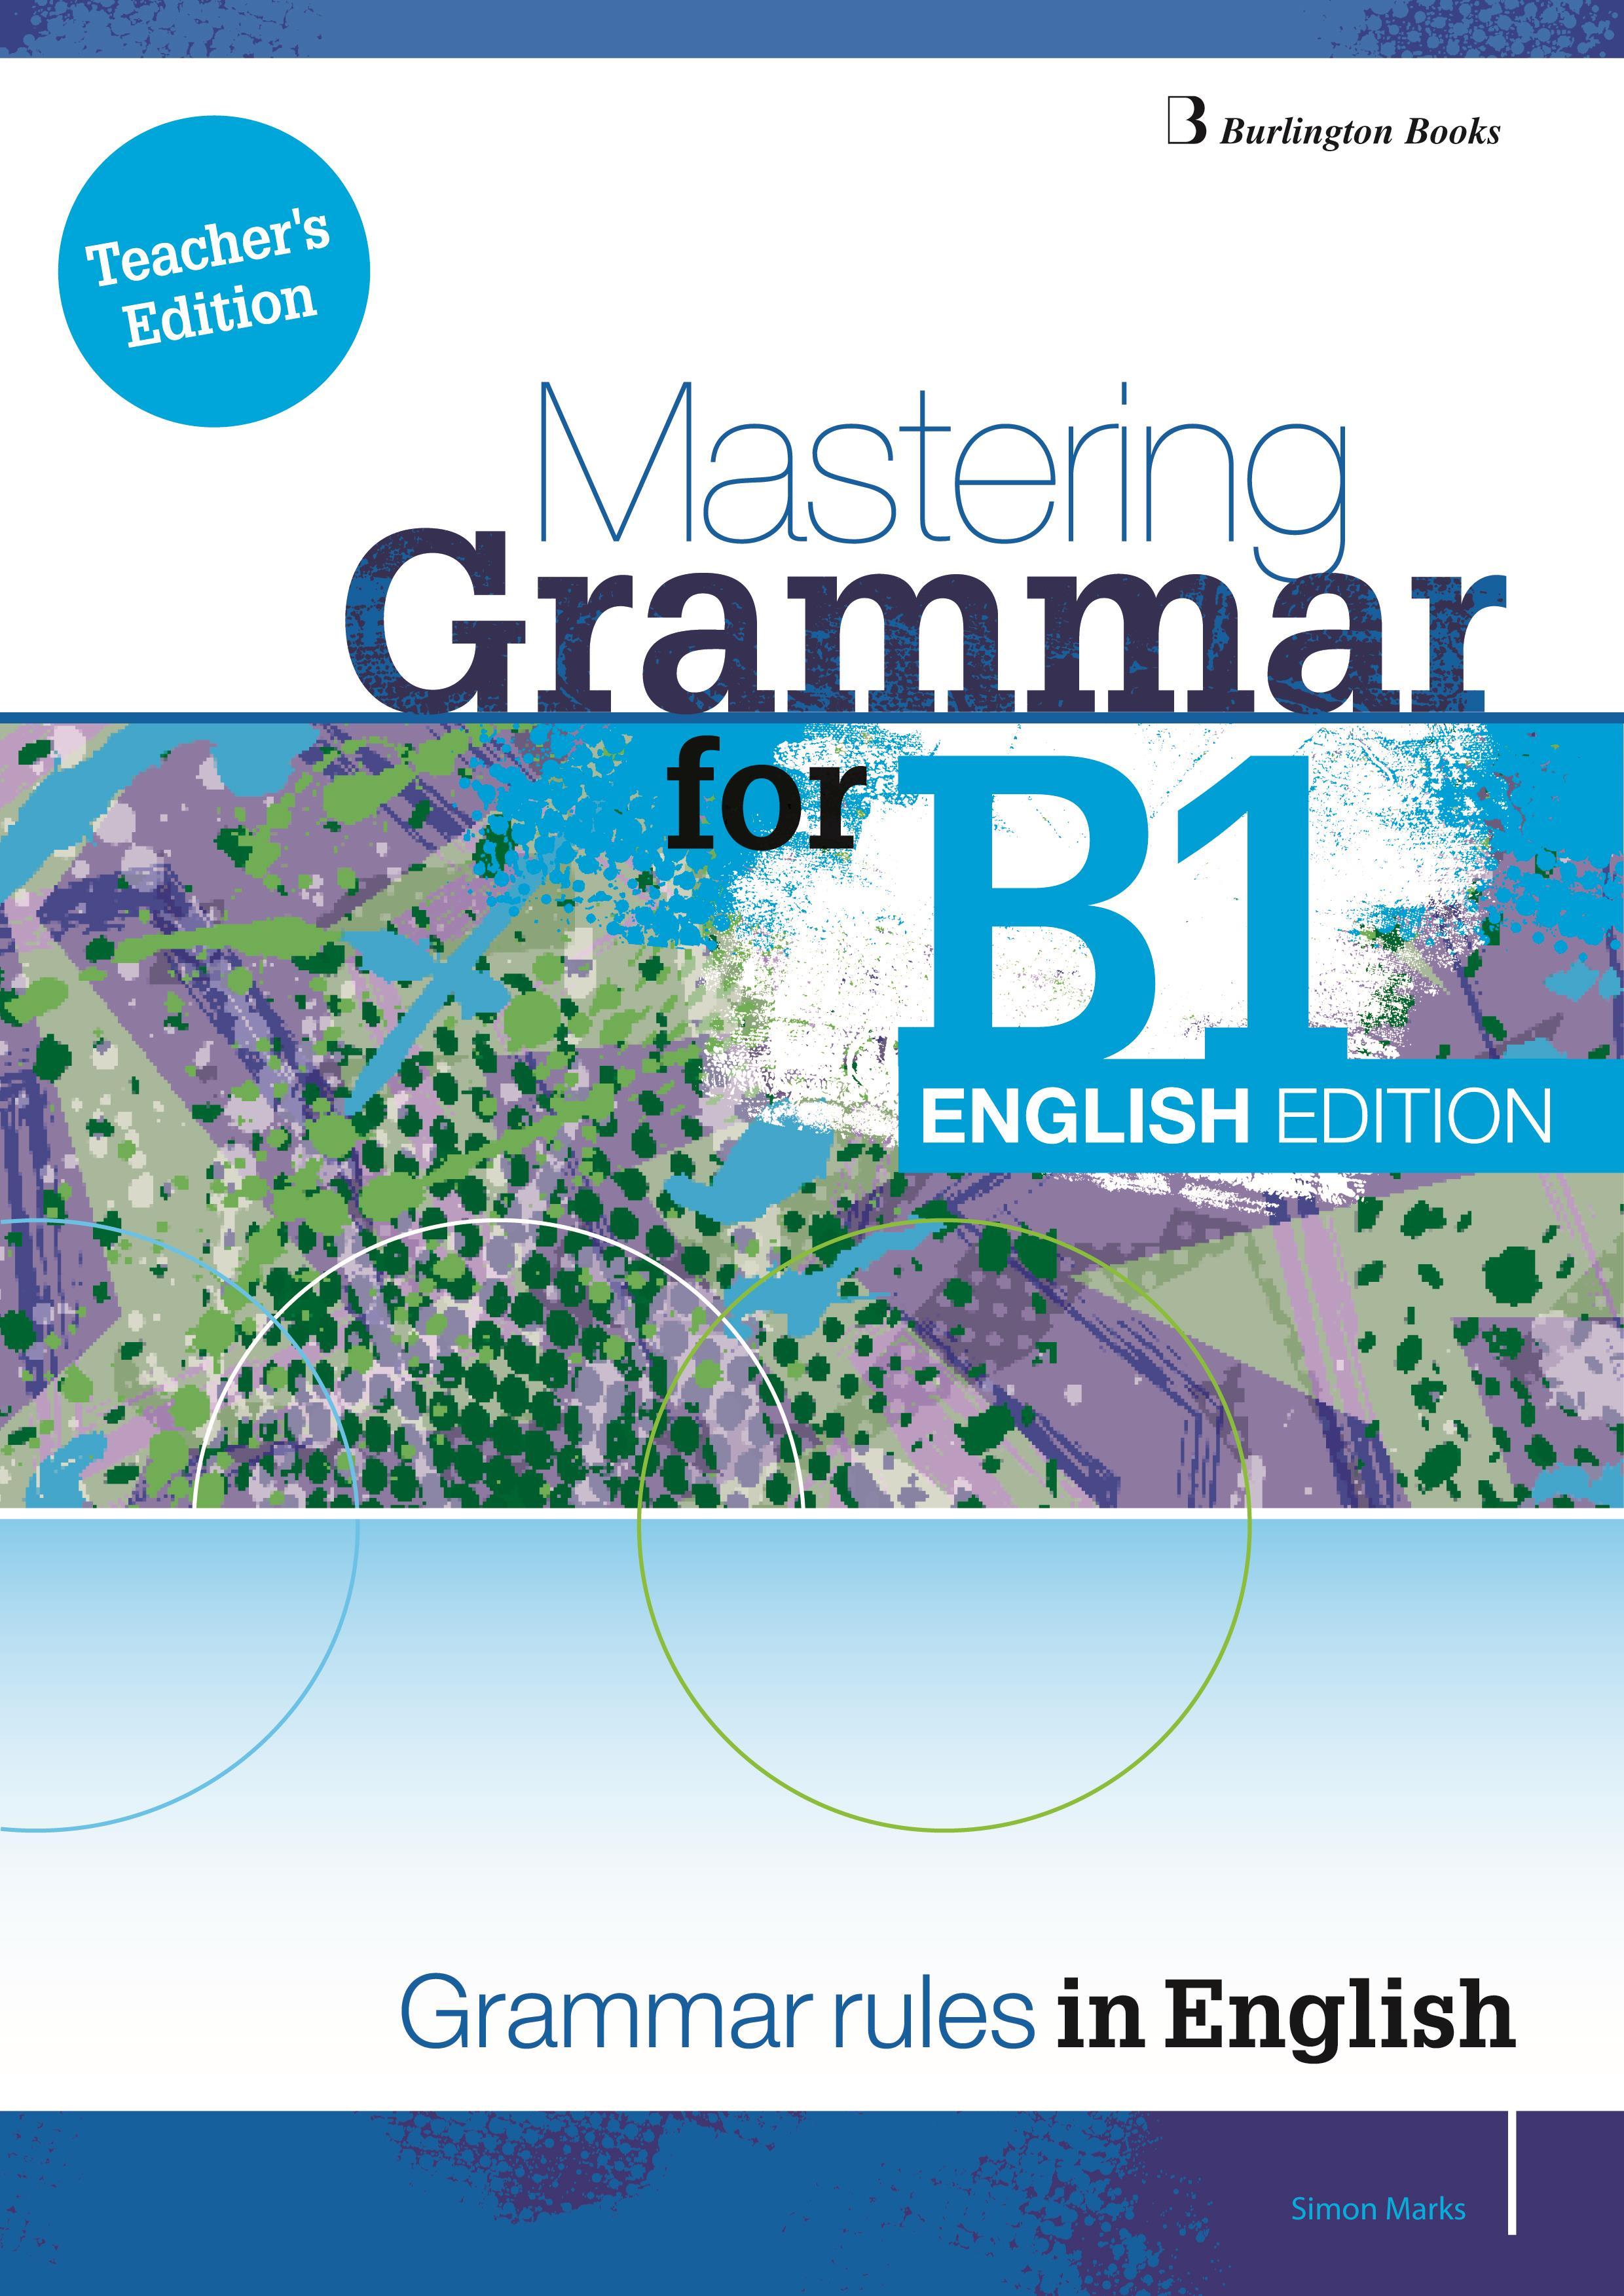 MASTERING GRAMMAR FOR B1 TCHR S ENGLISH EDITION